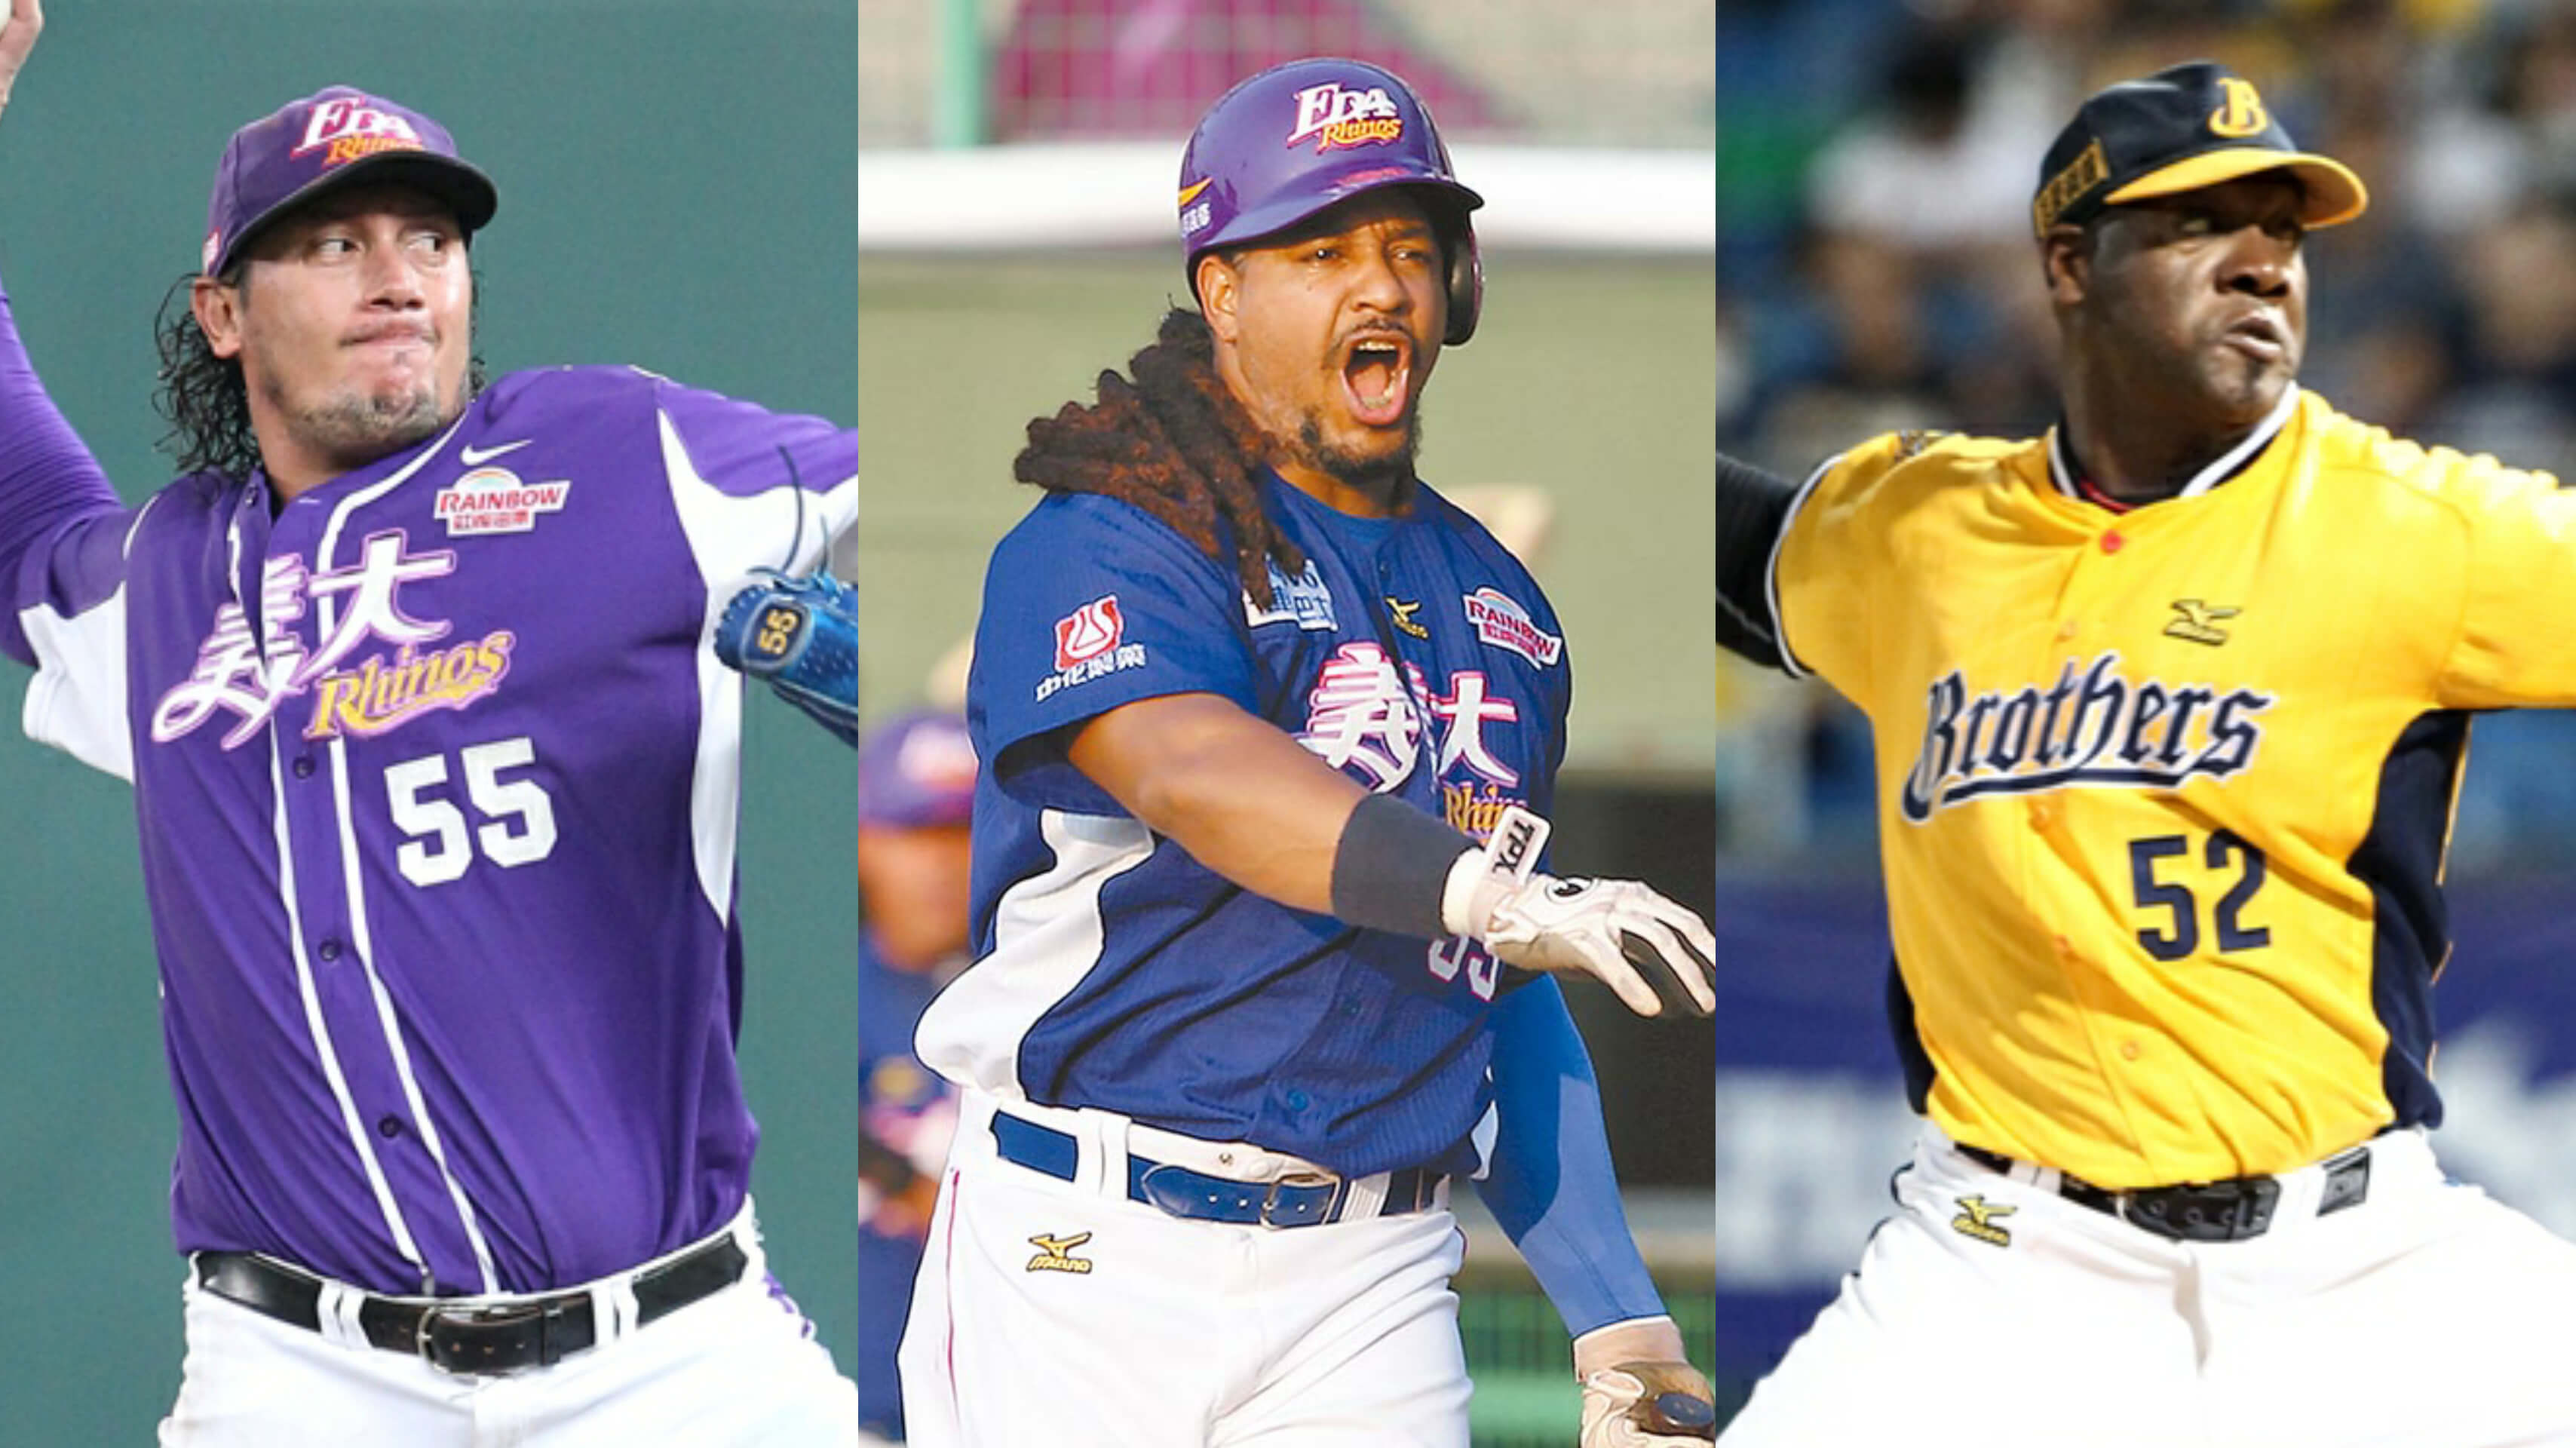 Freddy Garcia, Manny Ramirez, Jose Contreras in CPBL